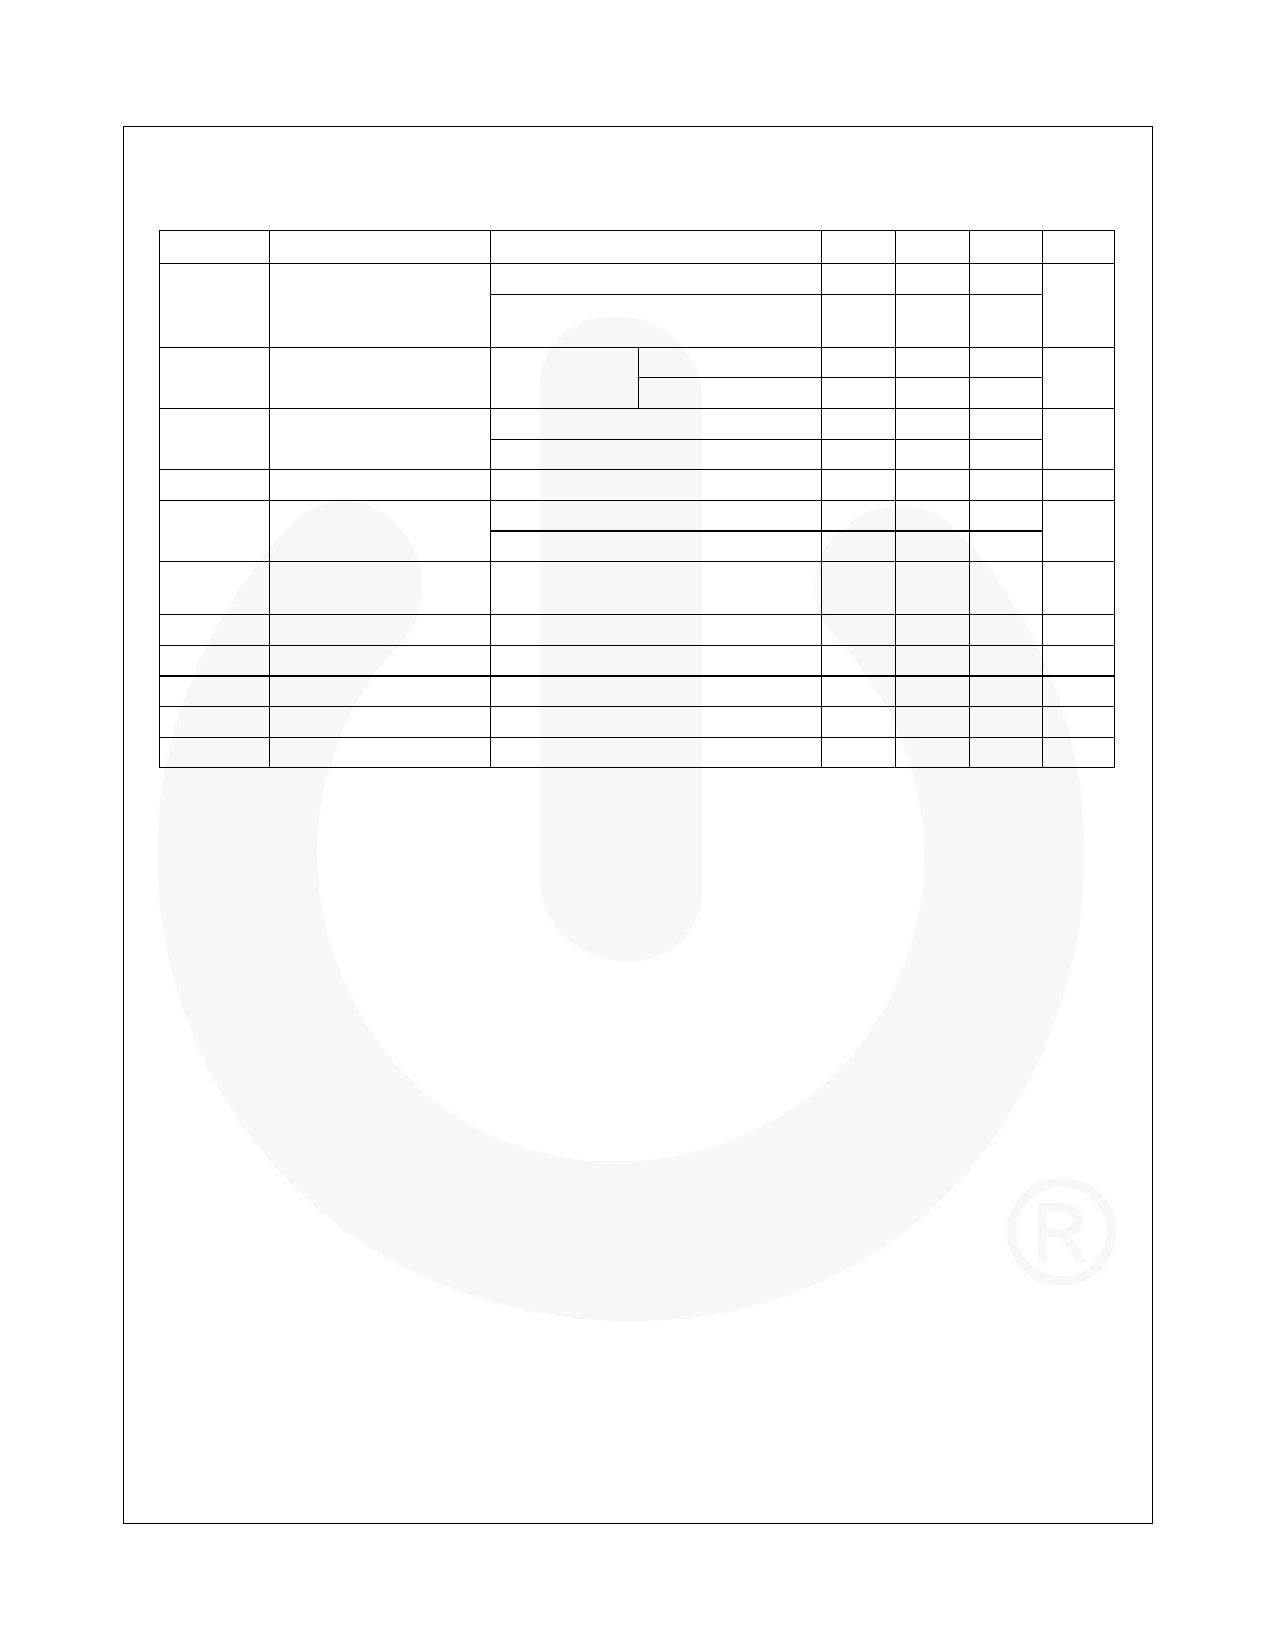 KA7905TU pdf, ピン配列